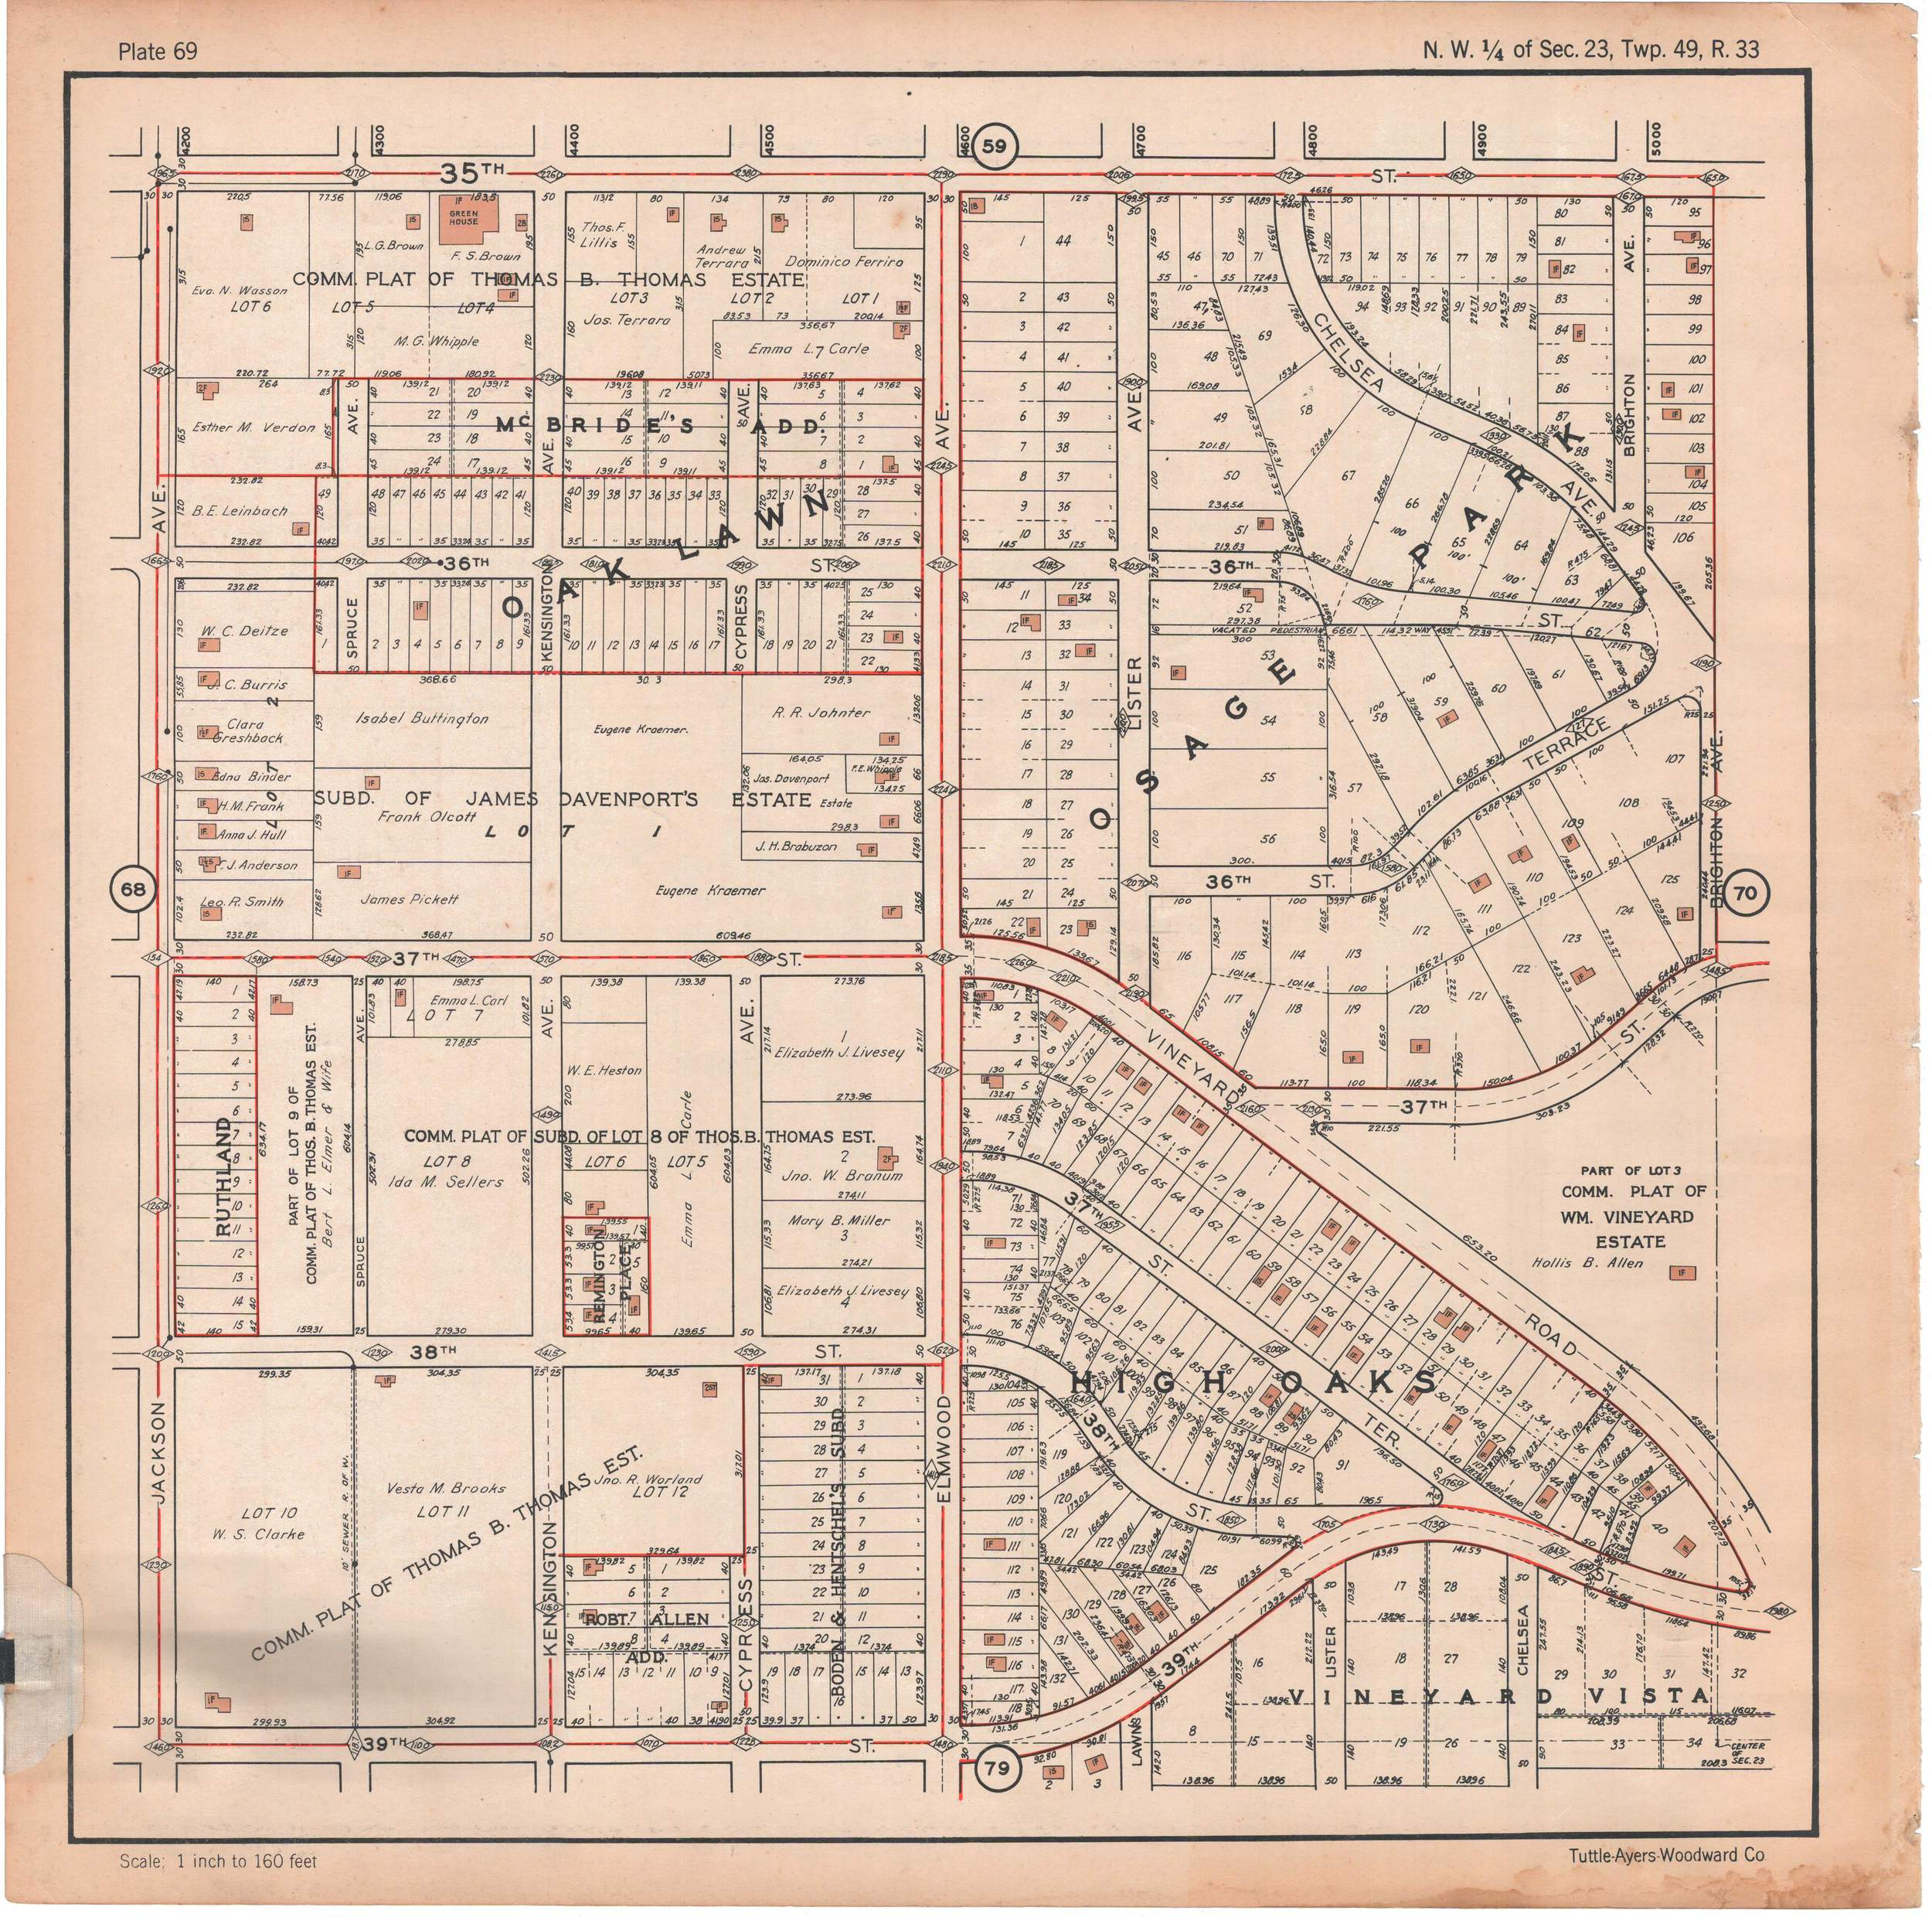 1925 TUTTLE_AYERS_Plate 69.JPG